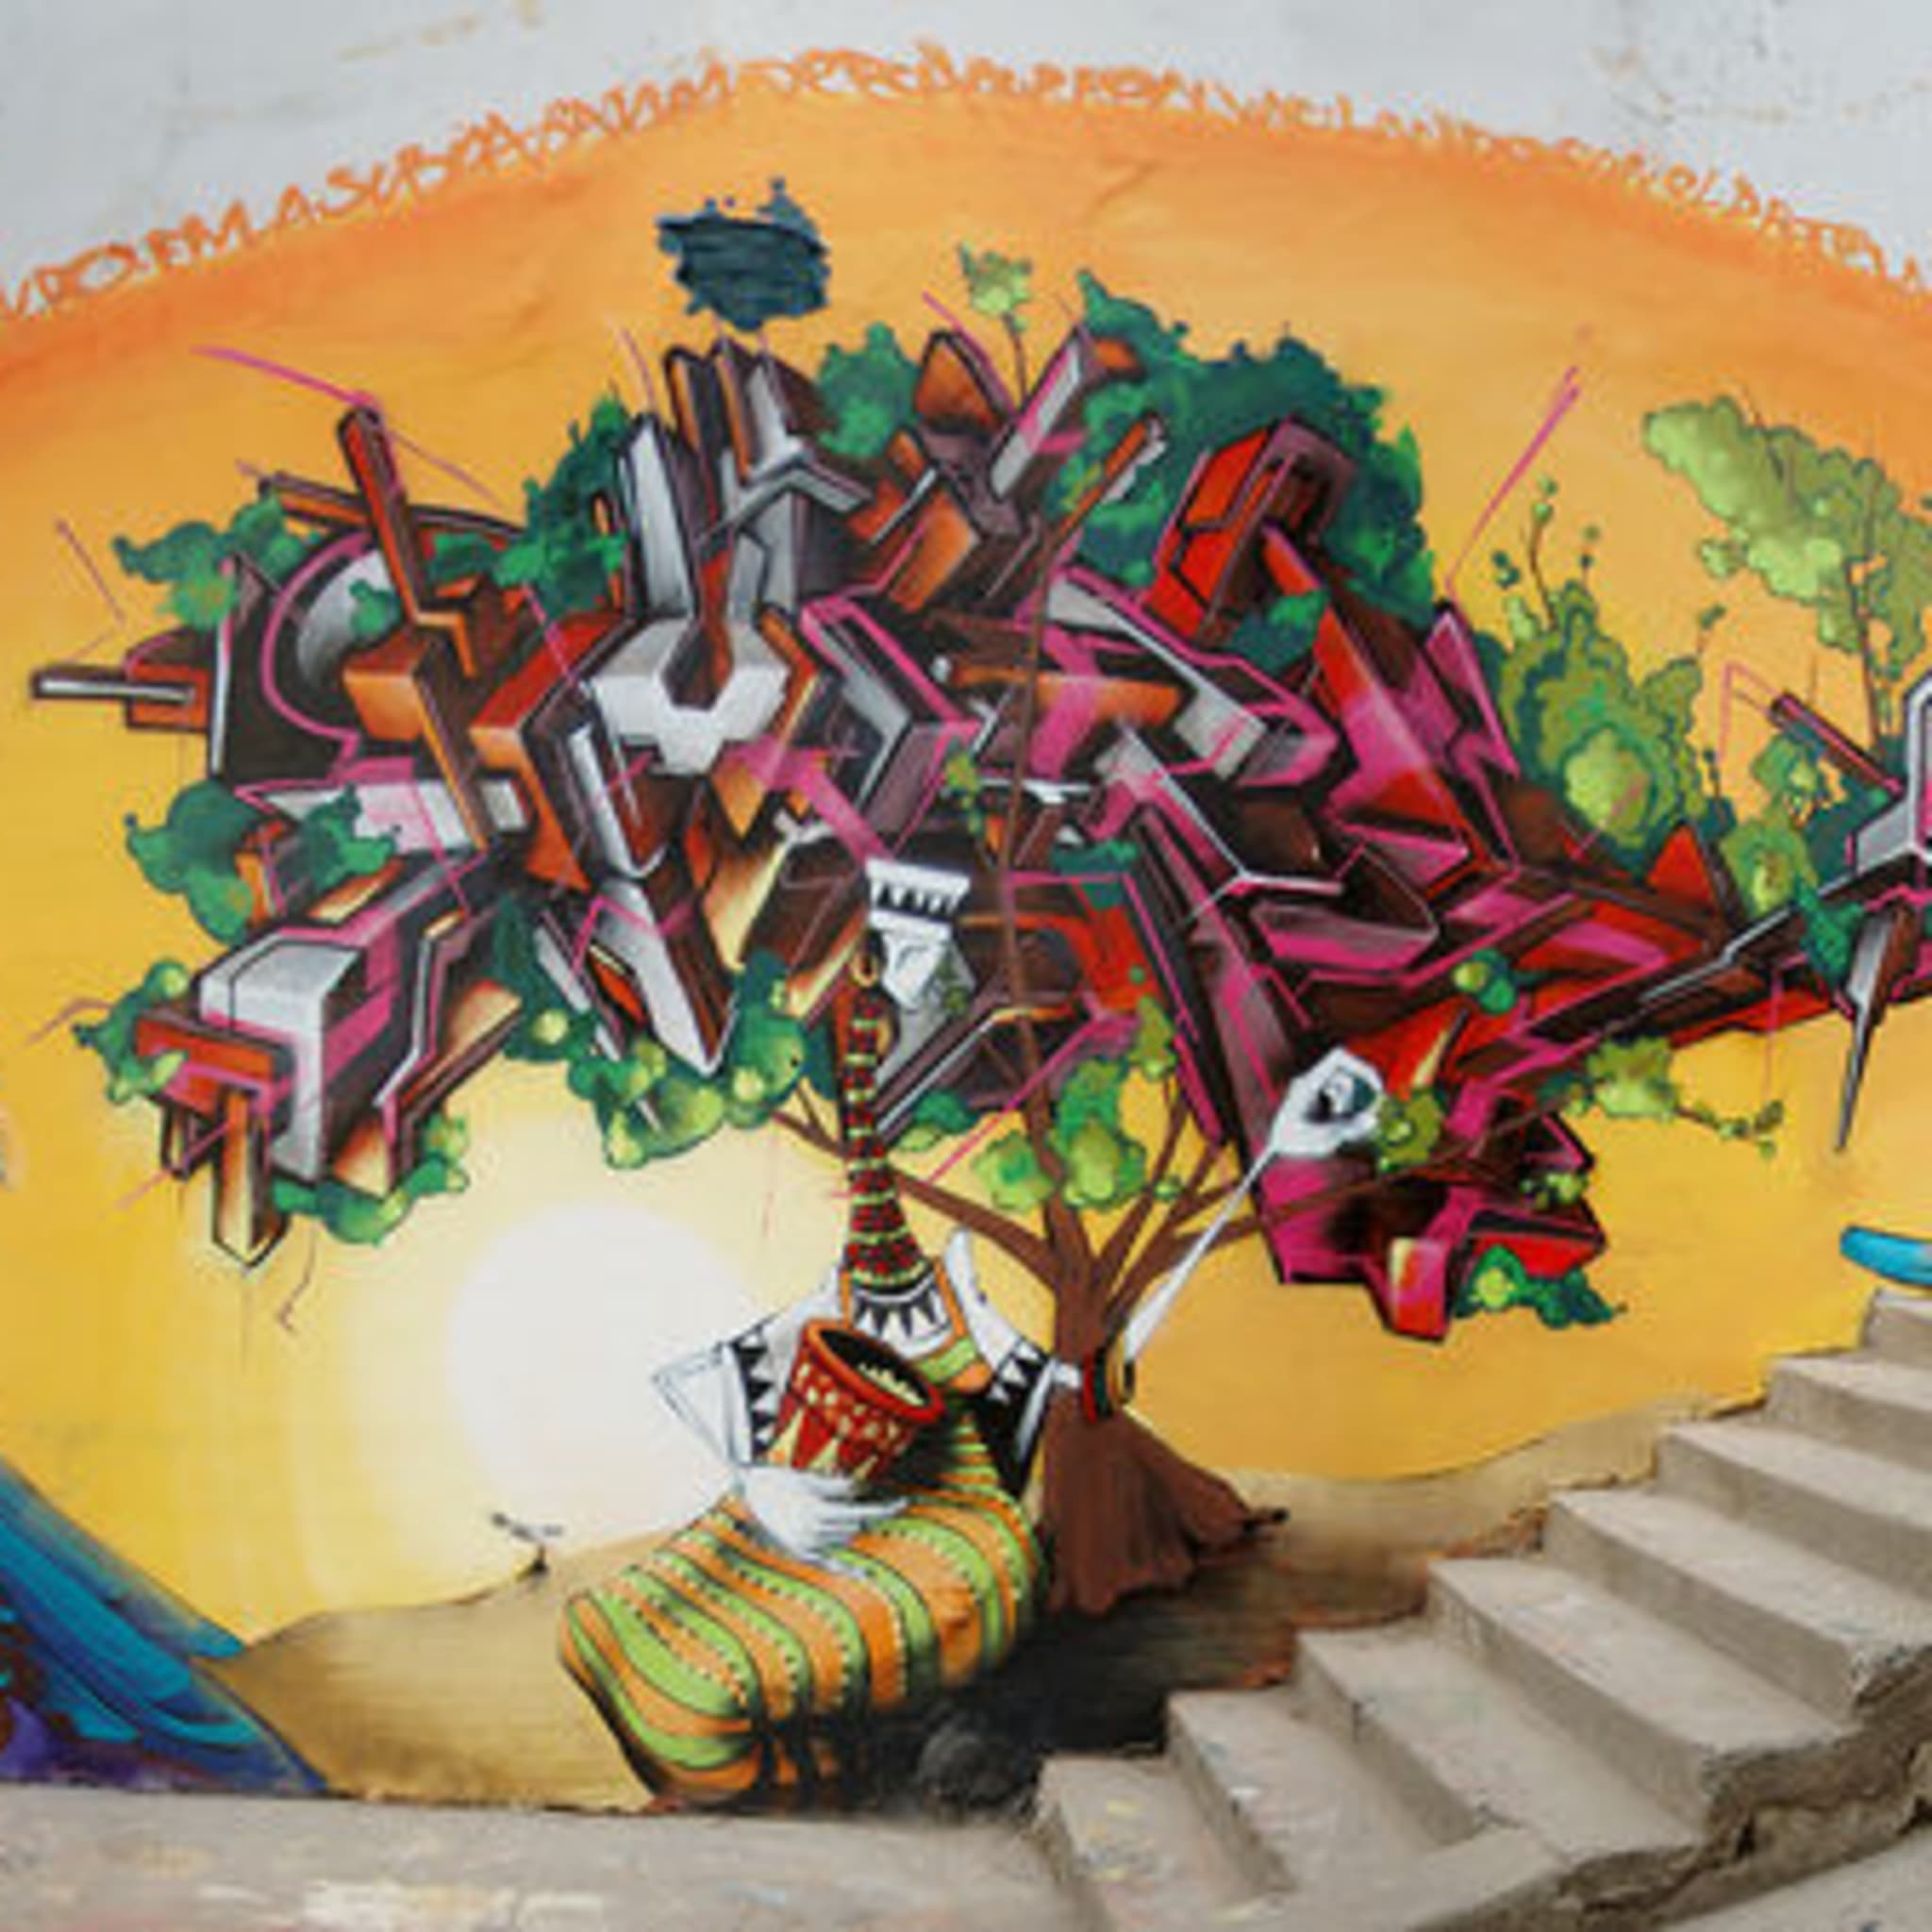 Œuvre Par inti à Valparaíso